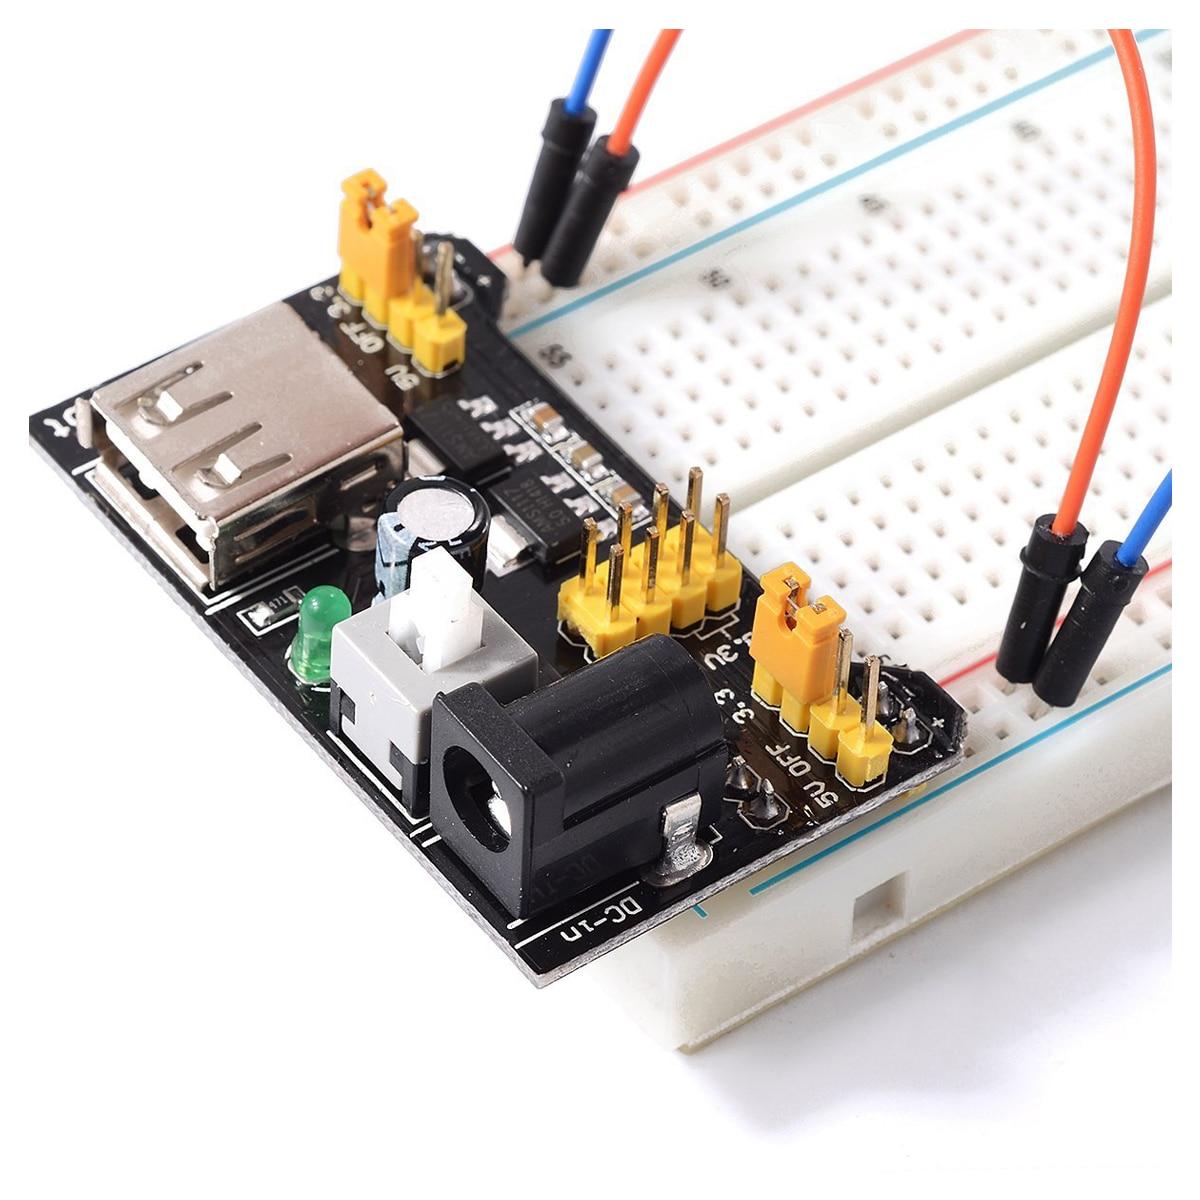 Breadbo 65 Stücke Jump Kabel Drähte Für Arduino Board Mb-102 830 Punkt Pwb-breadboard Netzteil Modul 3,3 V 5 V Netzteil